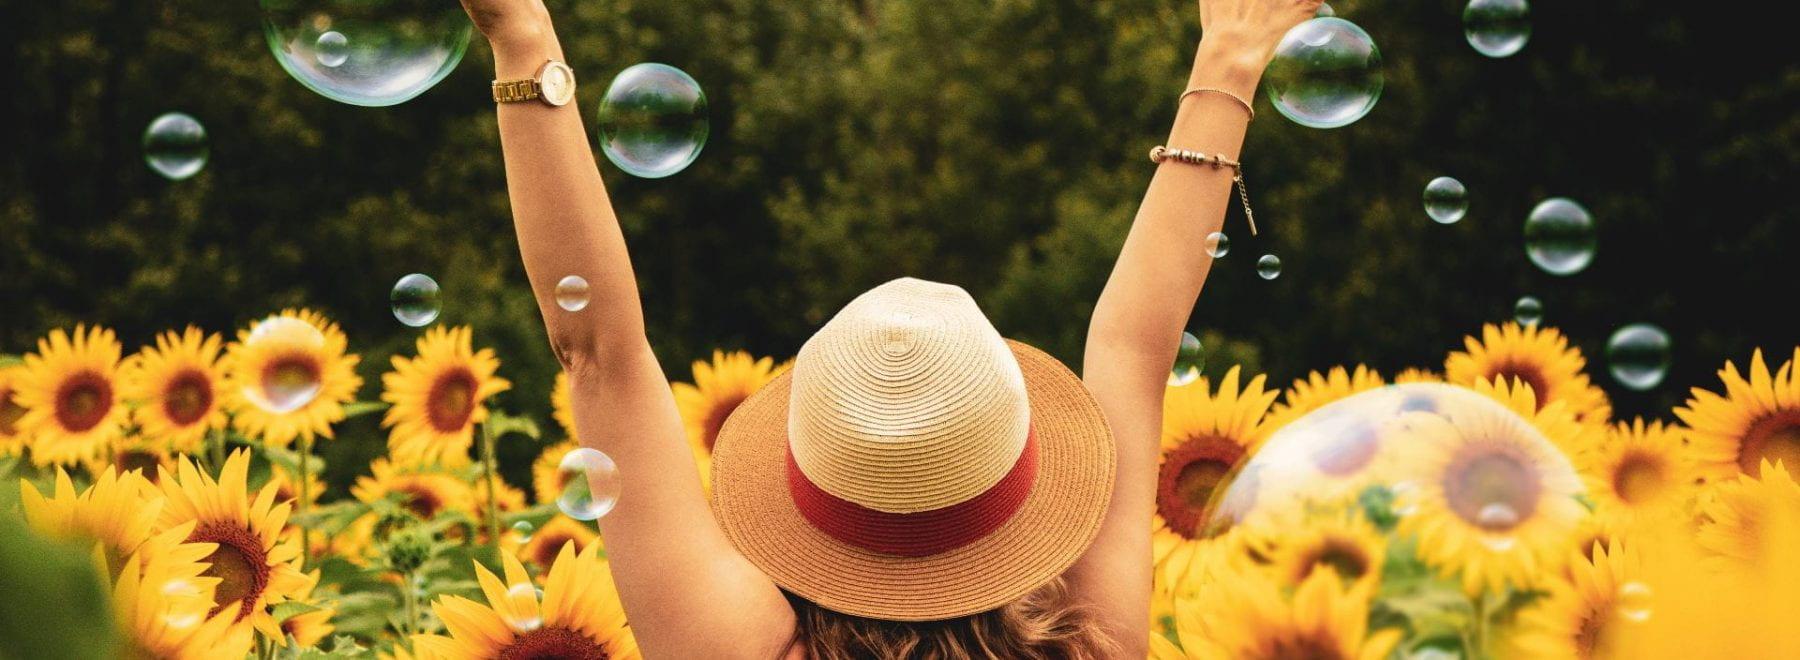 Woman stood in field of sunflowers